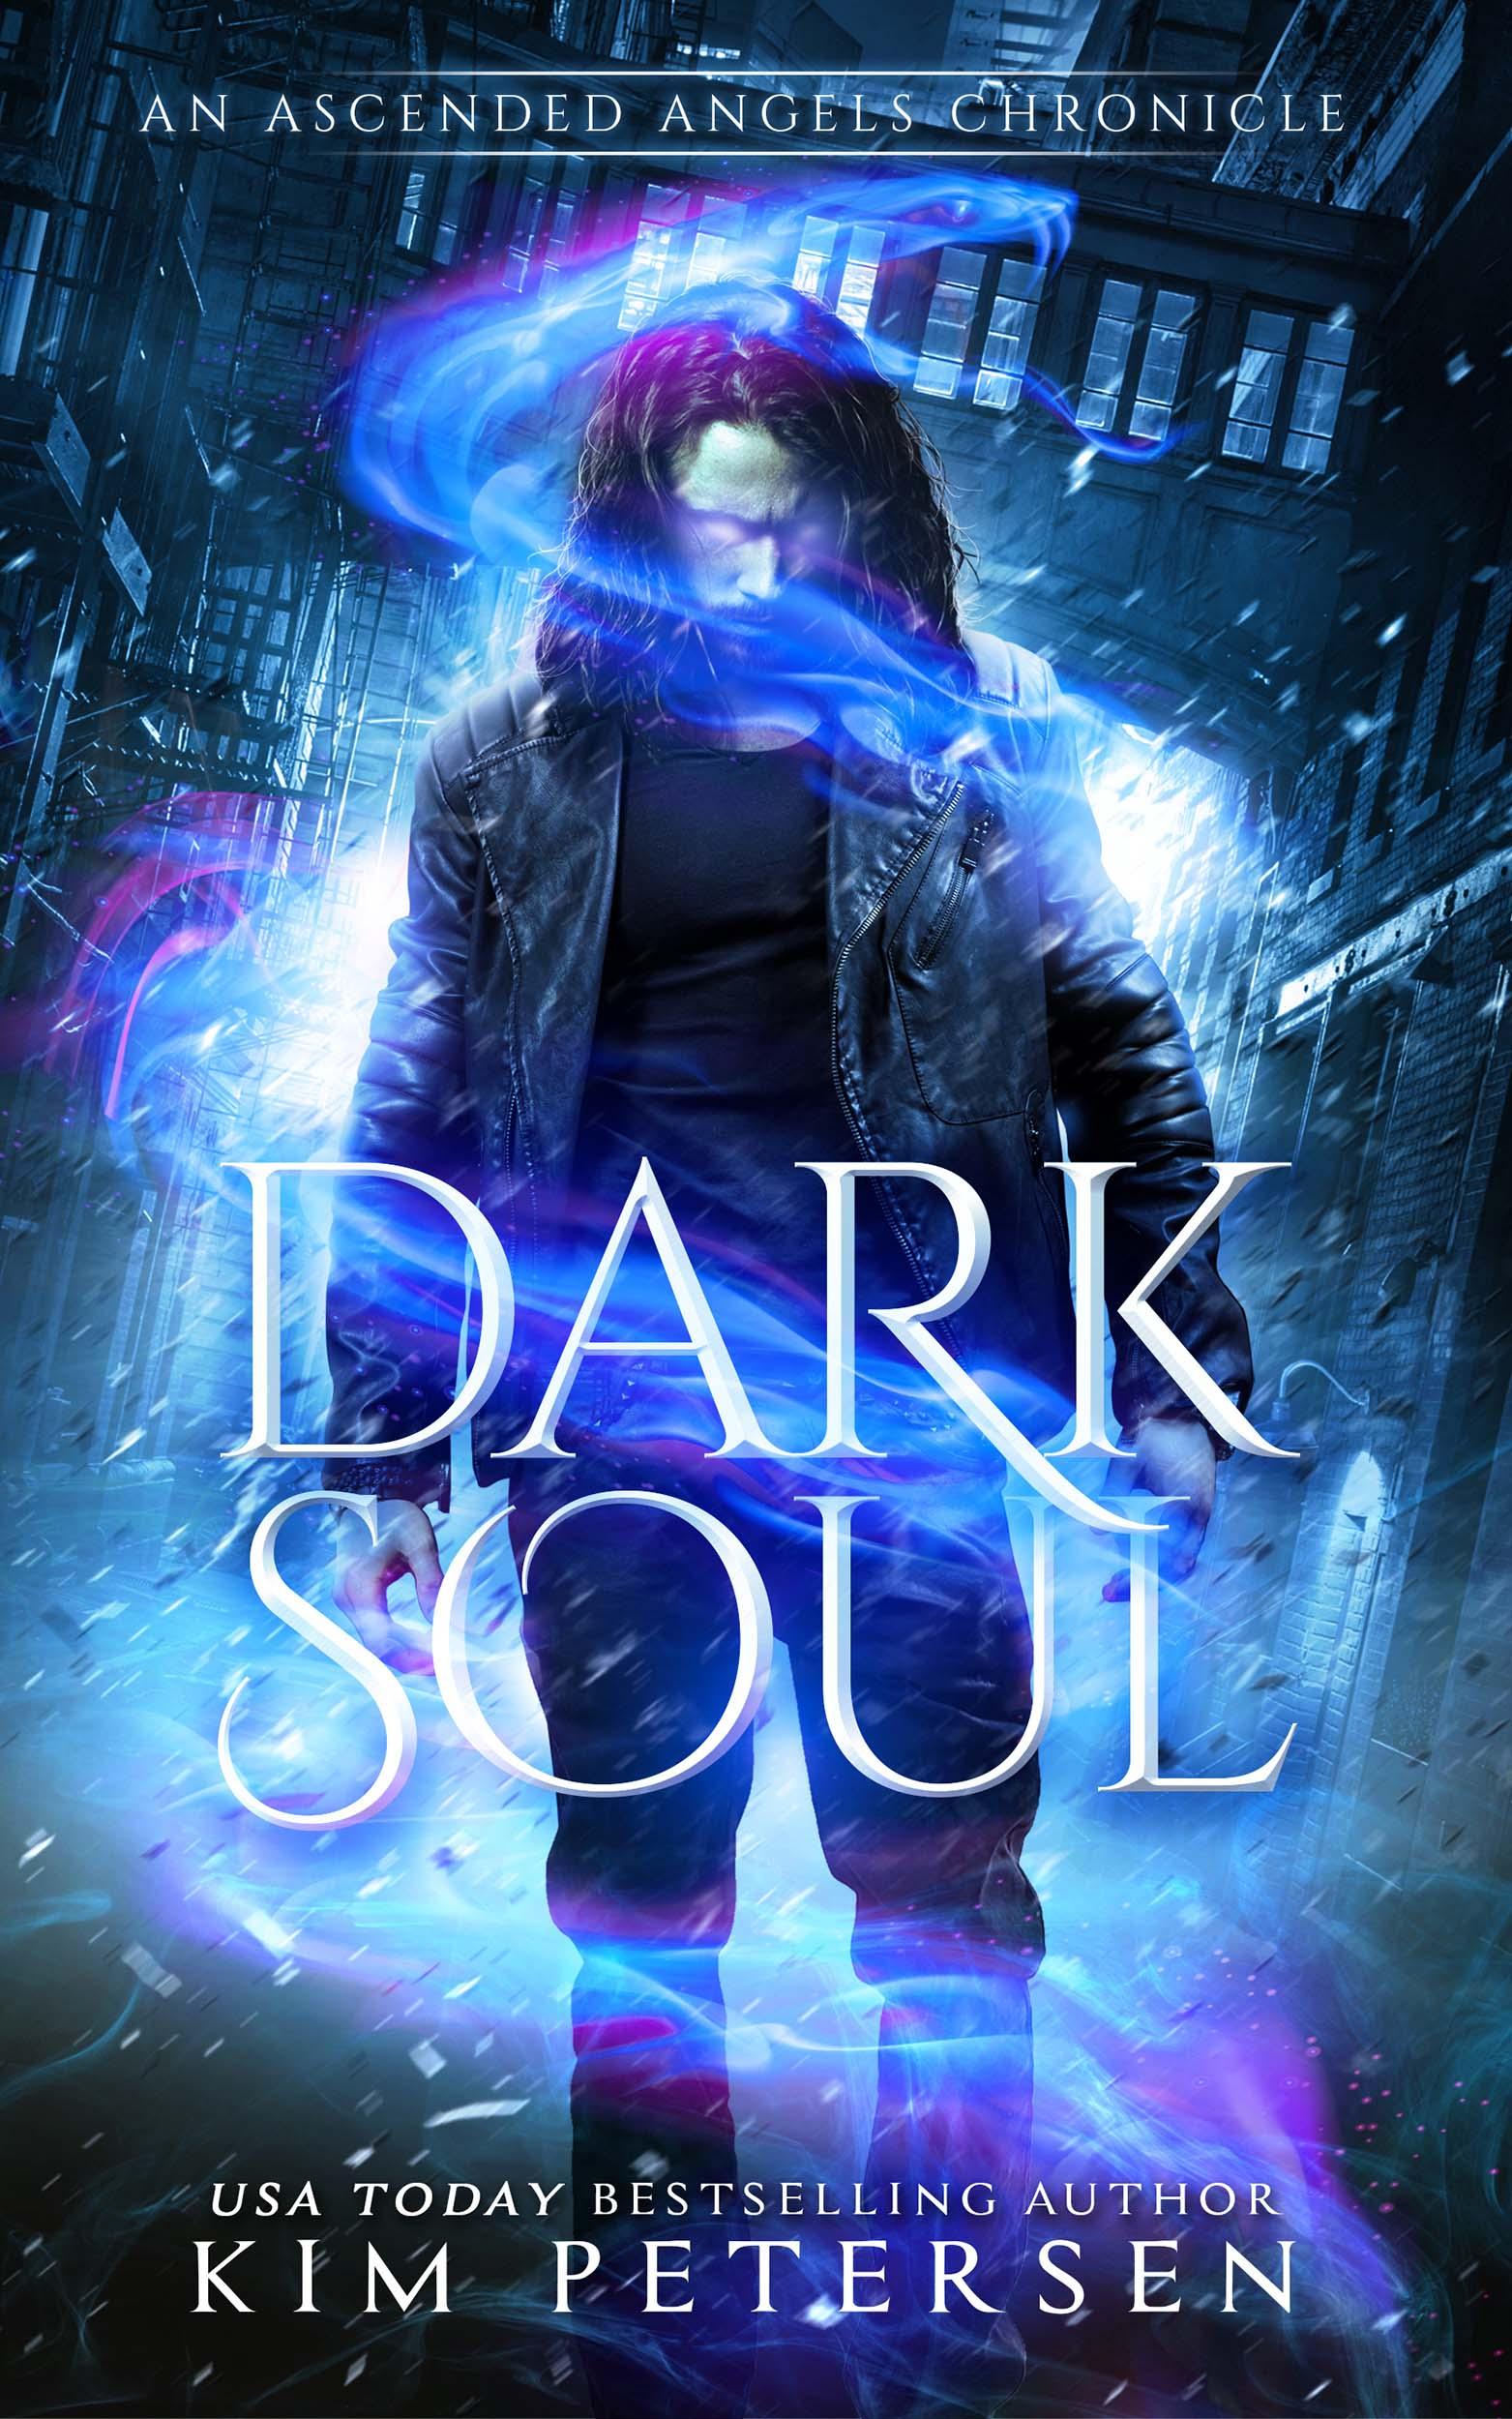 dark soul sml